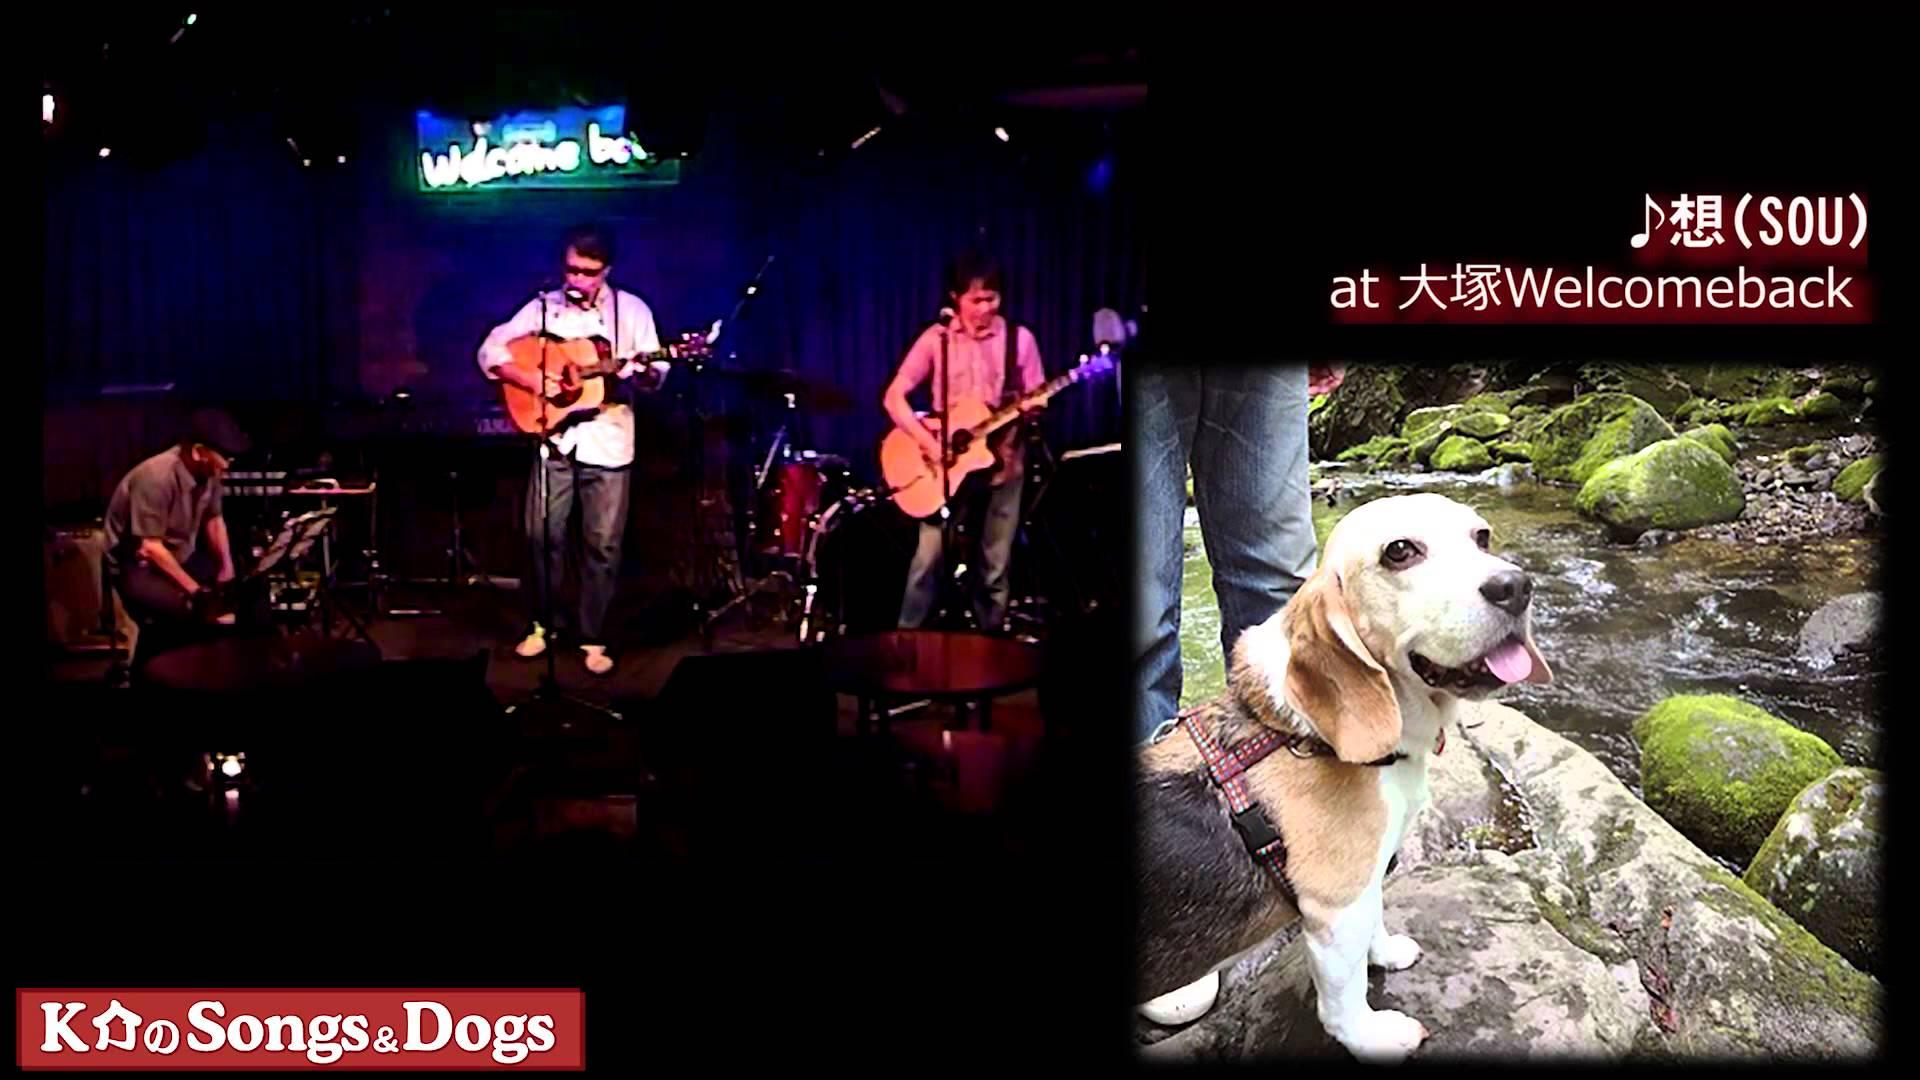 K介のSongs&Dogs週末はミュージシャン74